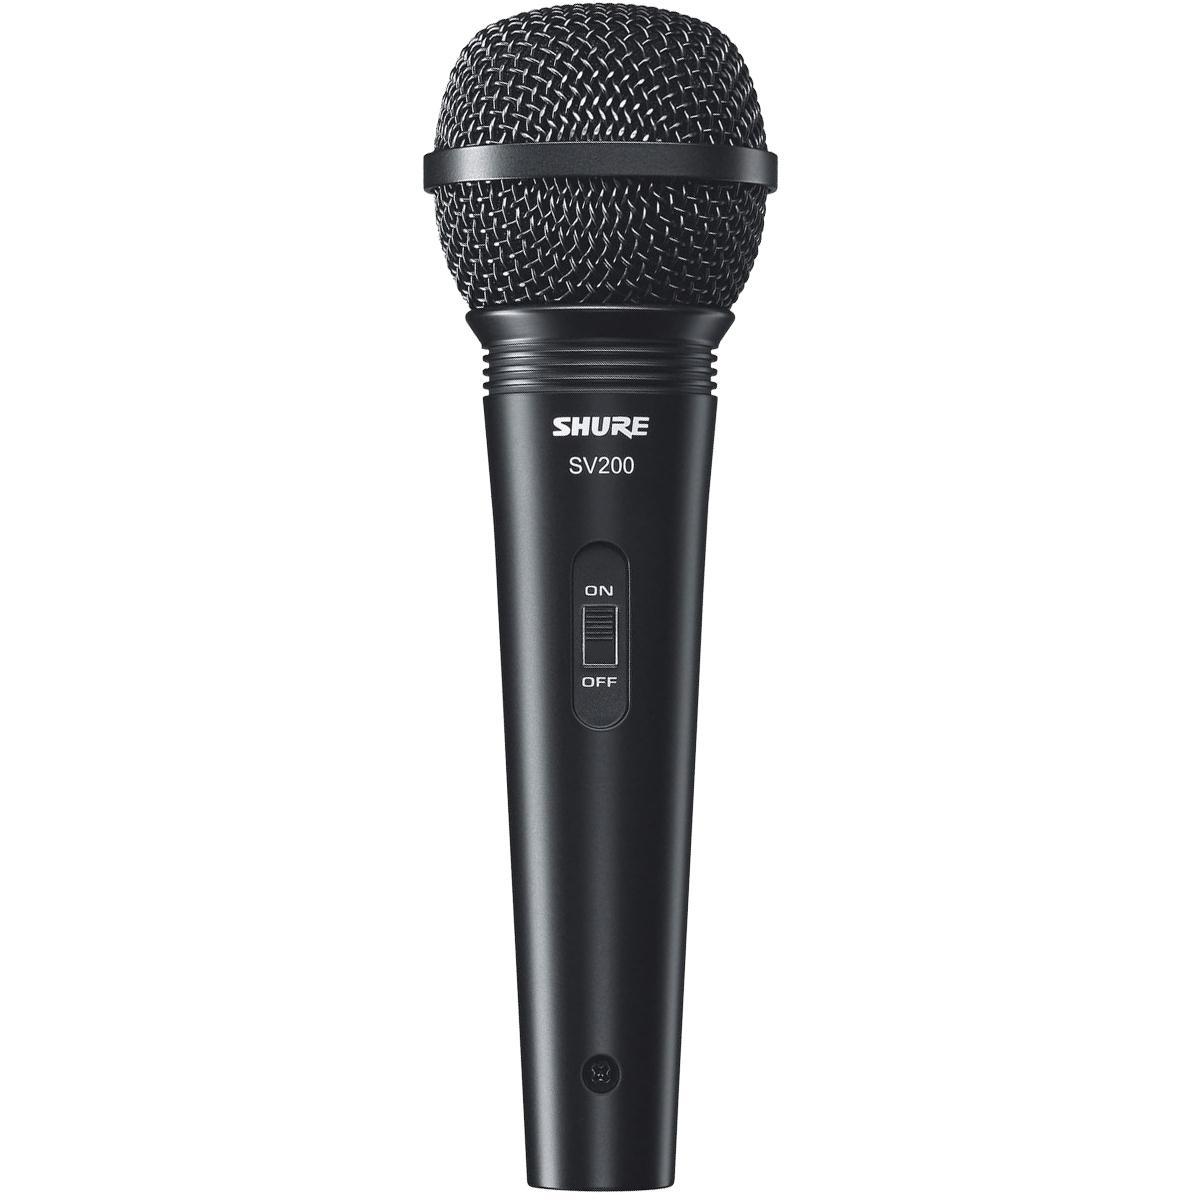 Shure Microfone Dinâmico Cardióide SV200 (Com Cabo)